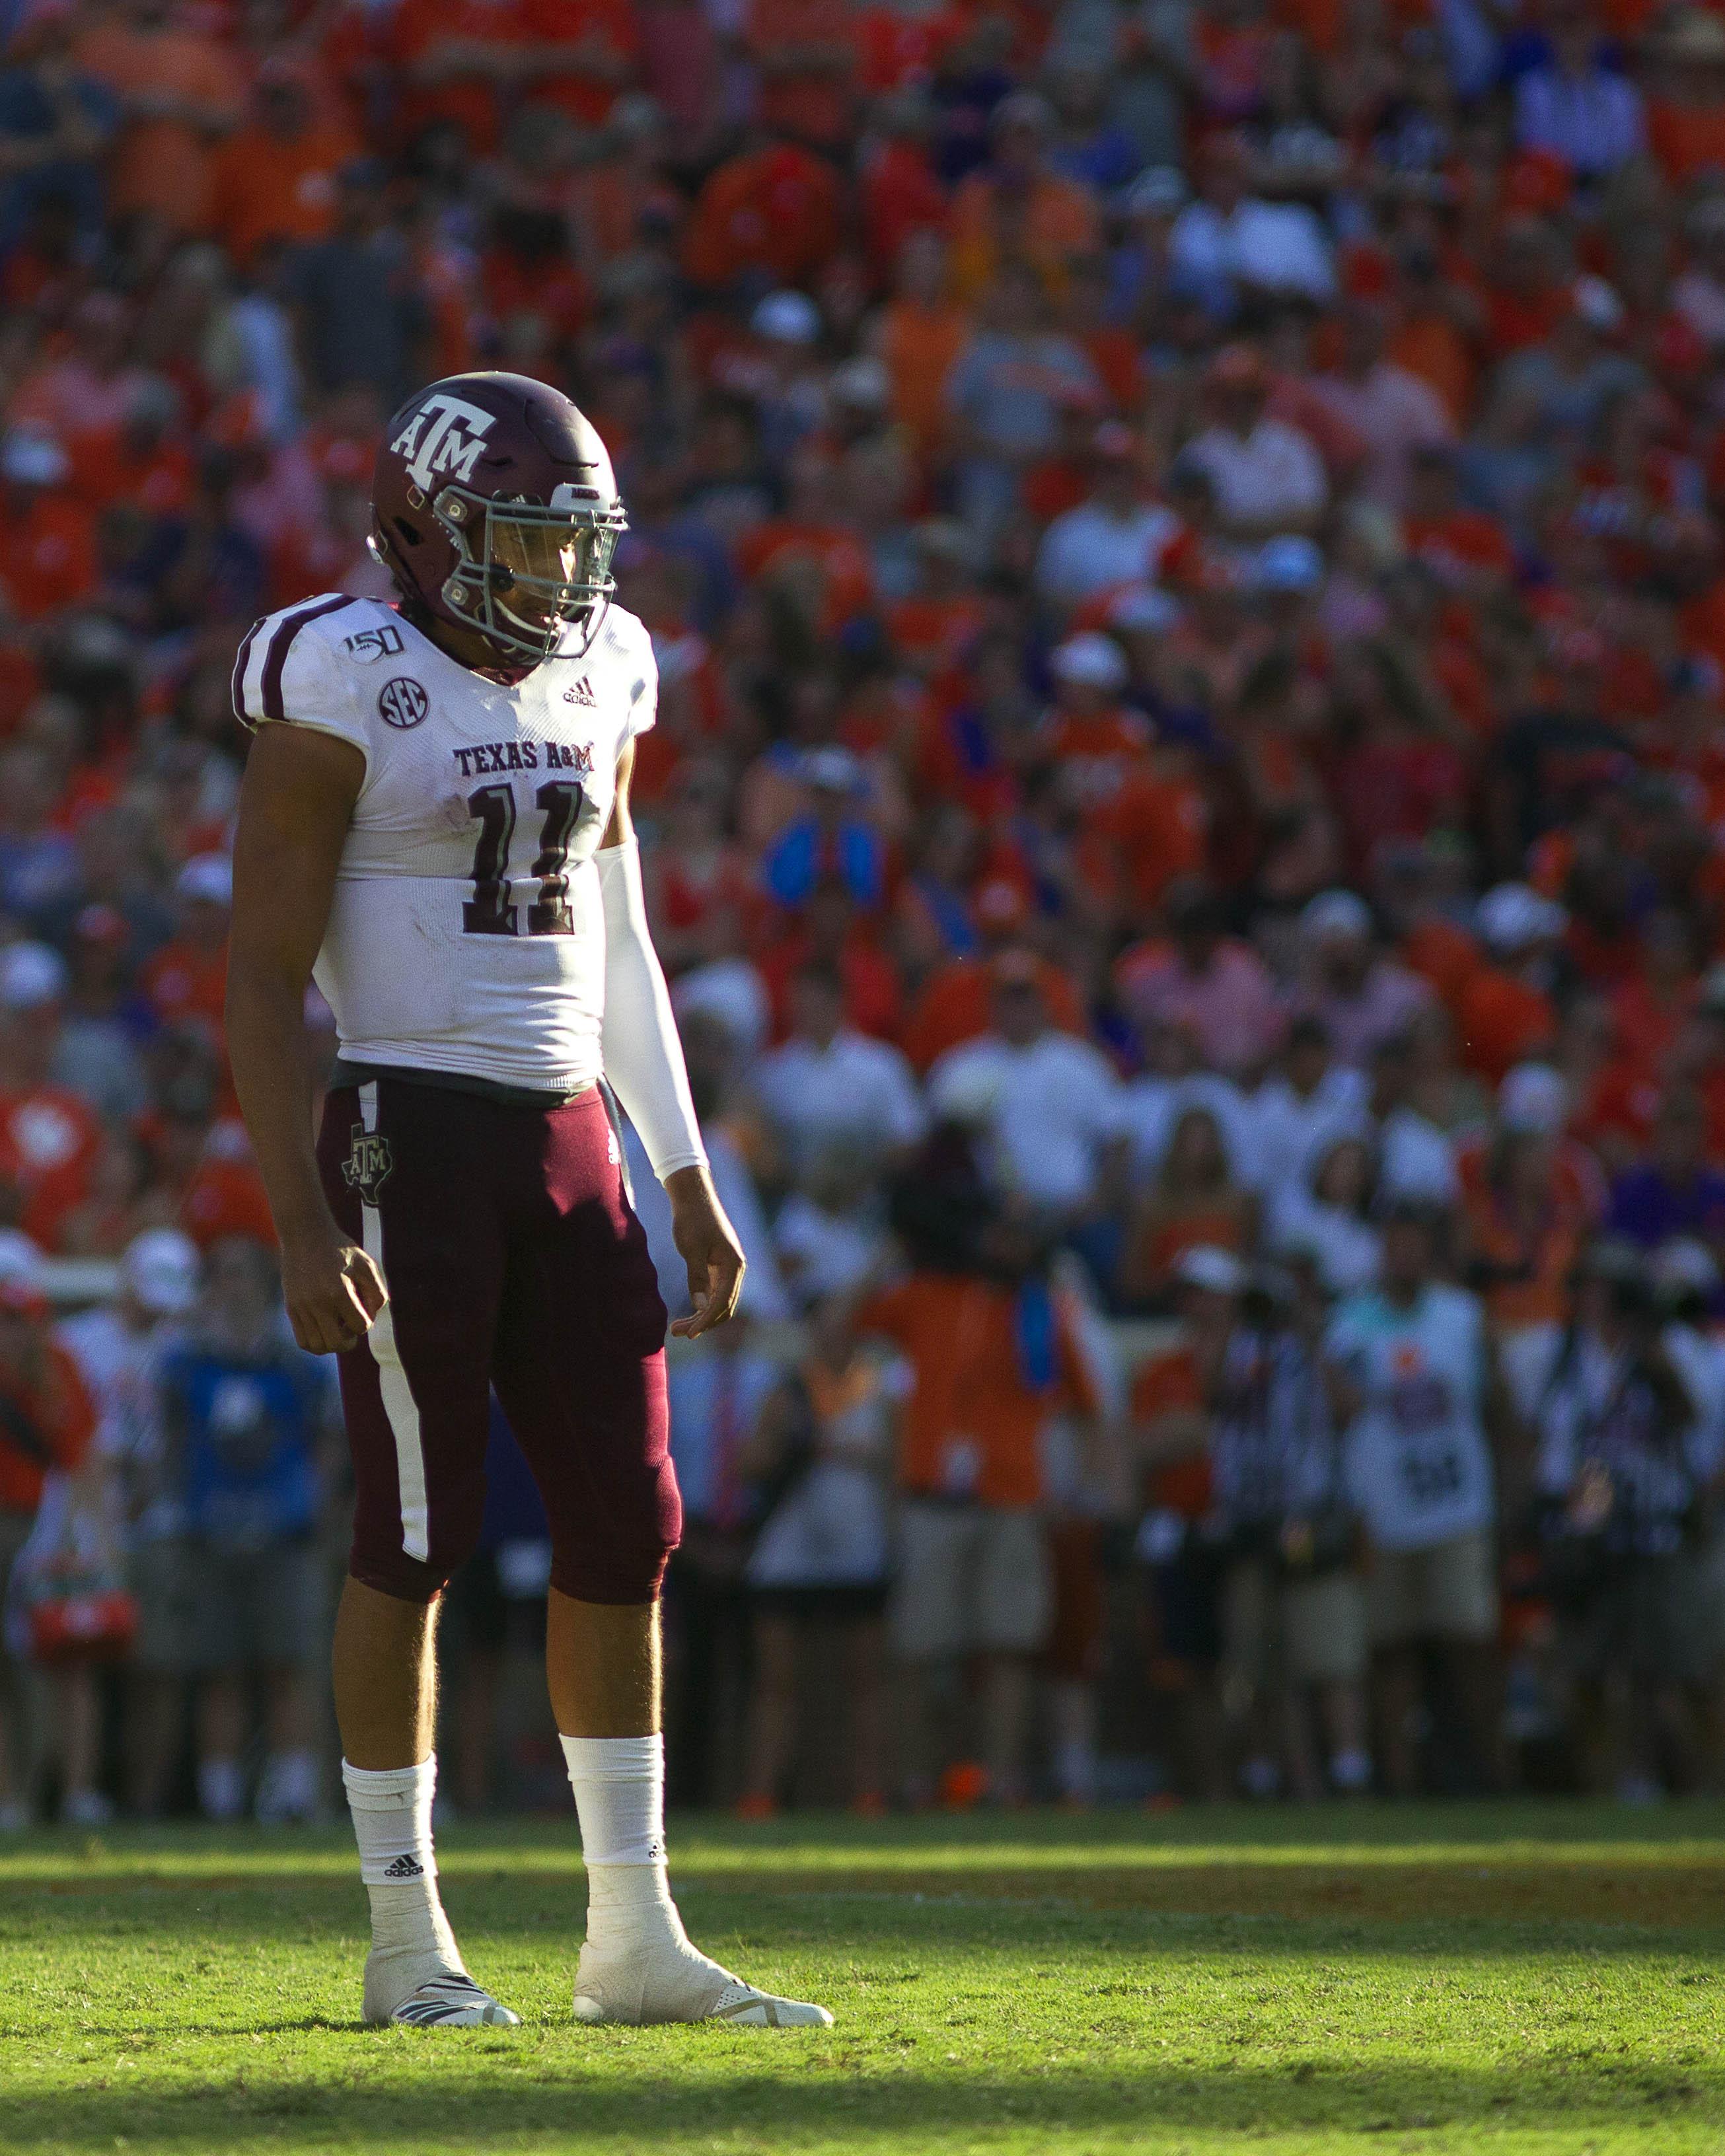 NCAA Football: Texas A&M at Clemson